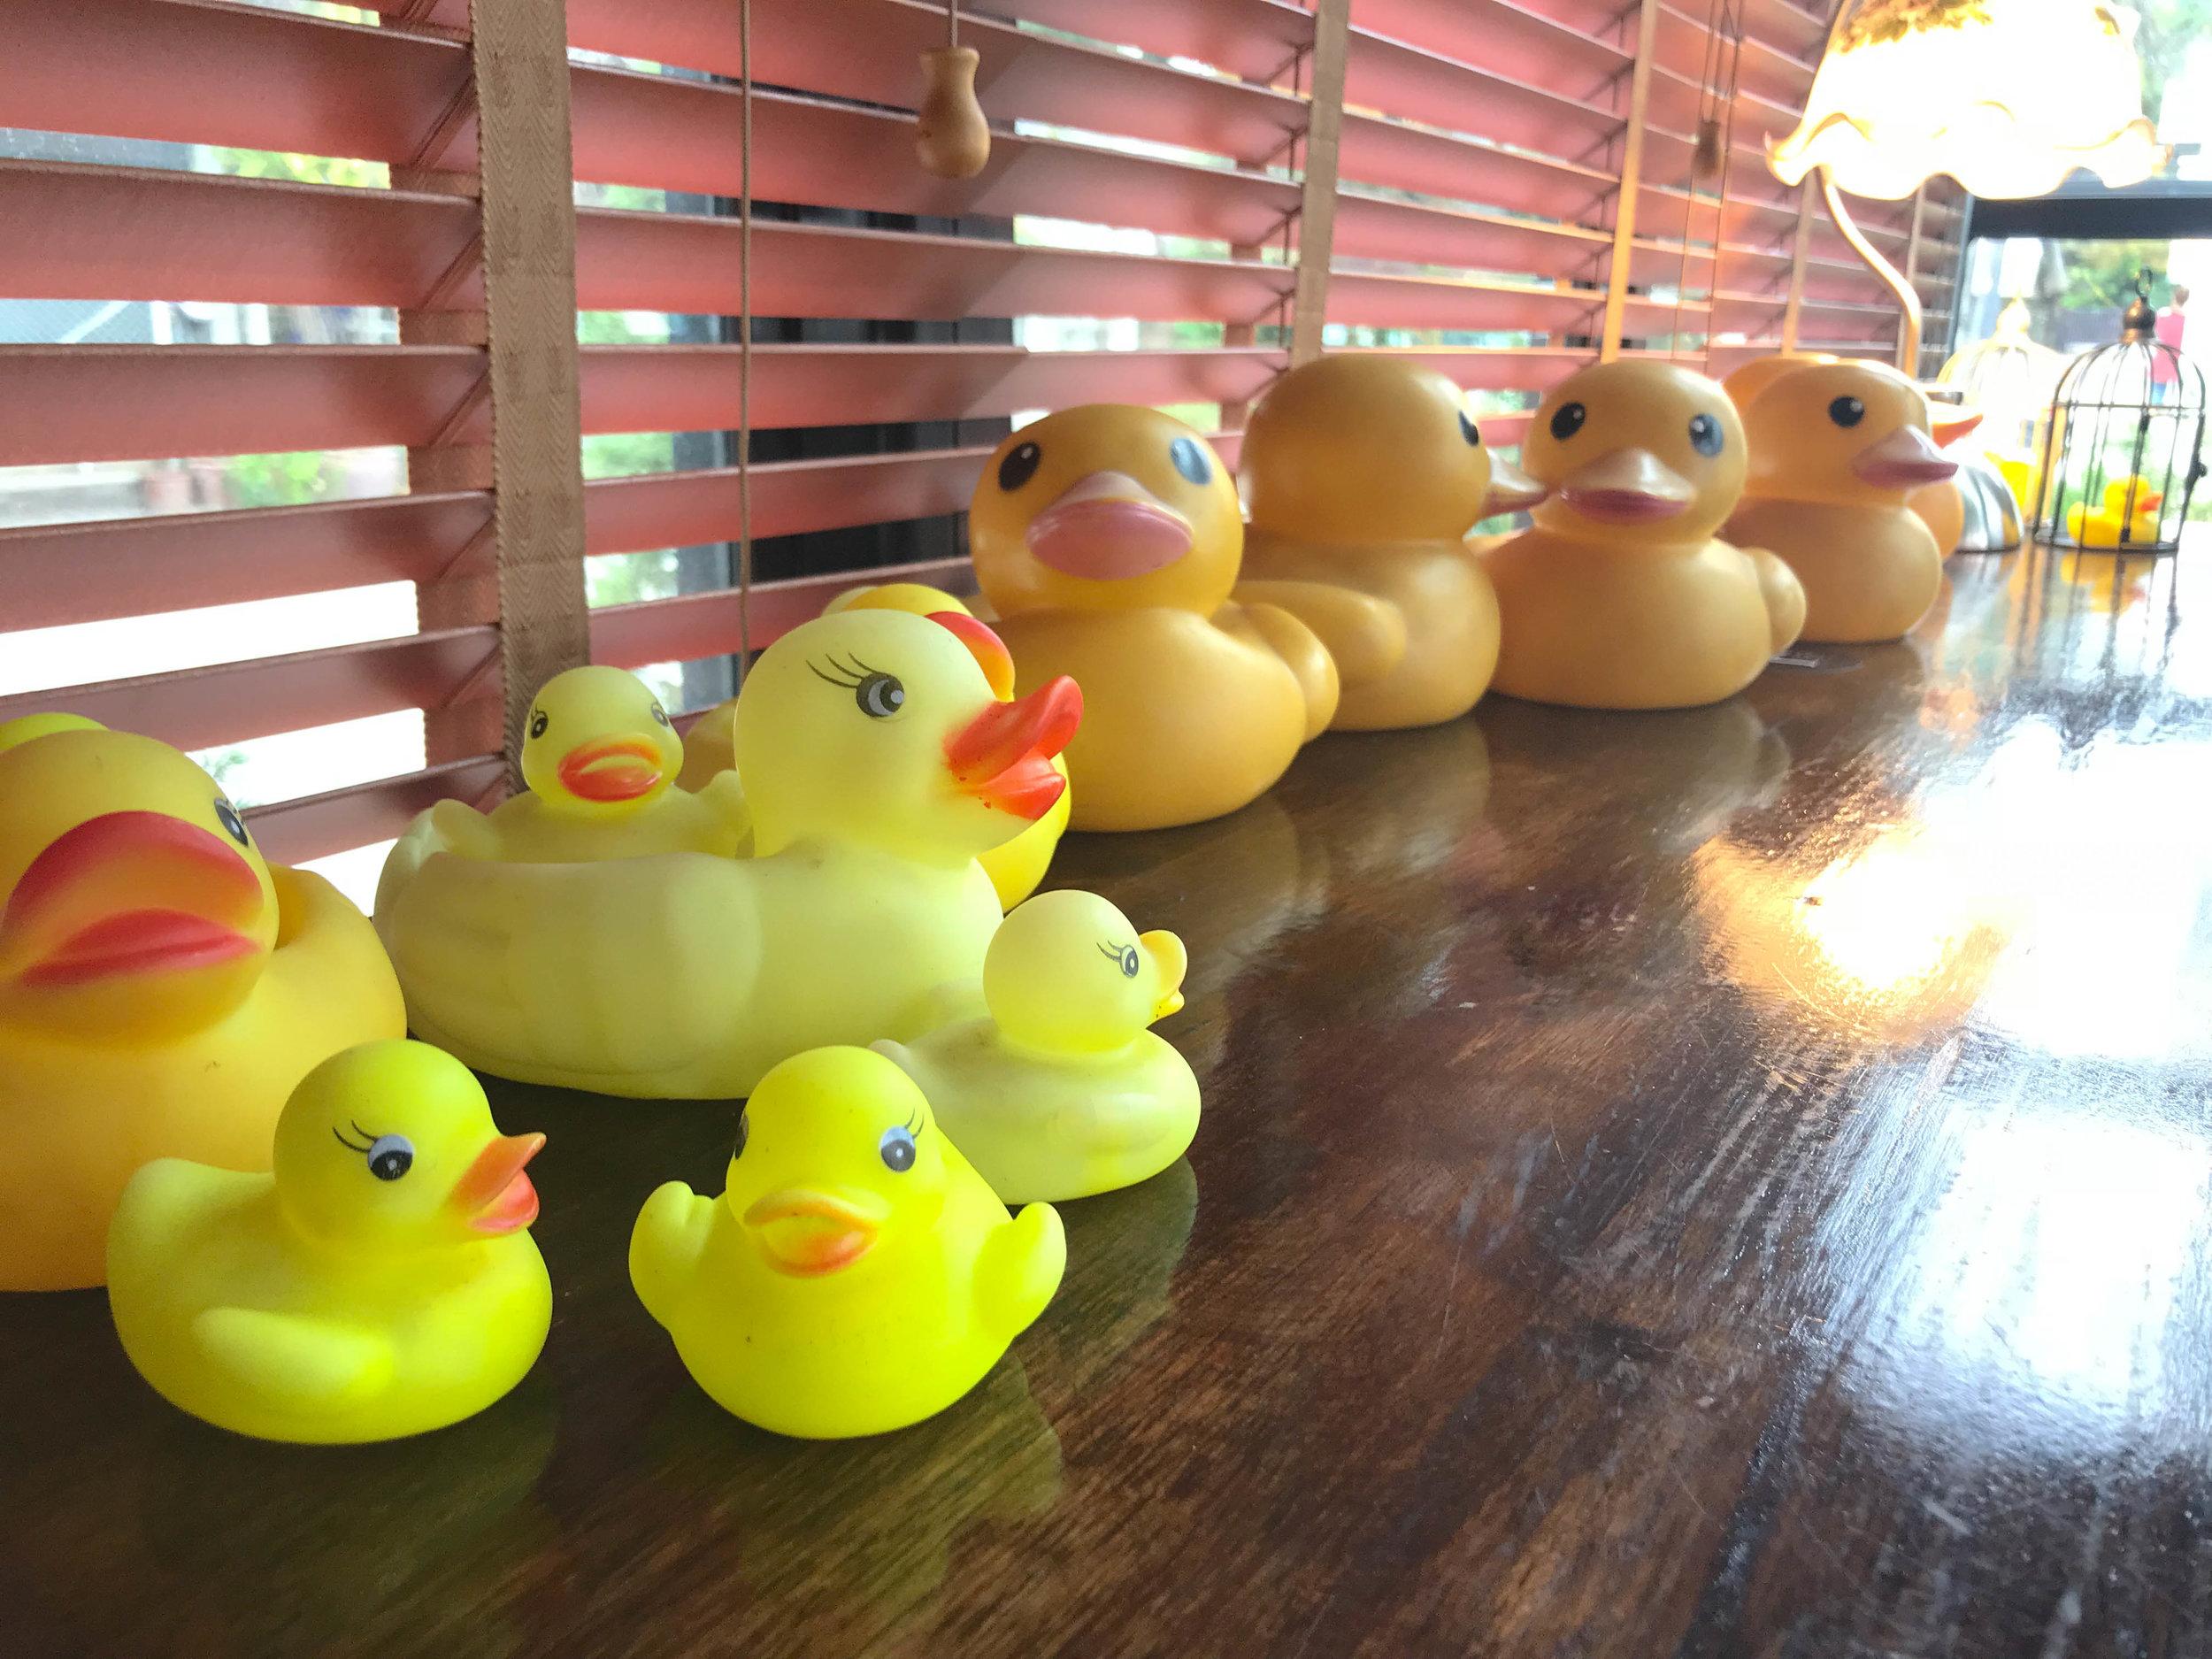 Ice Love You Chiang Mai Ice Cream - Bath tub yellow rubber ducky